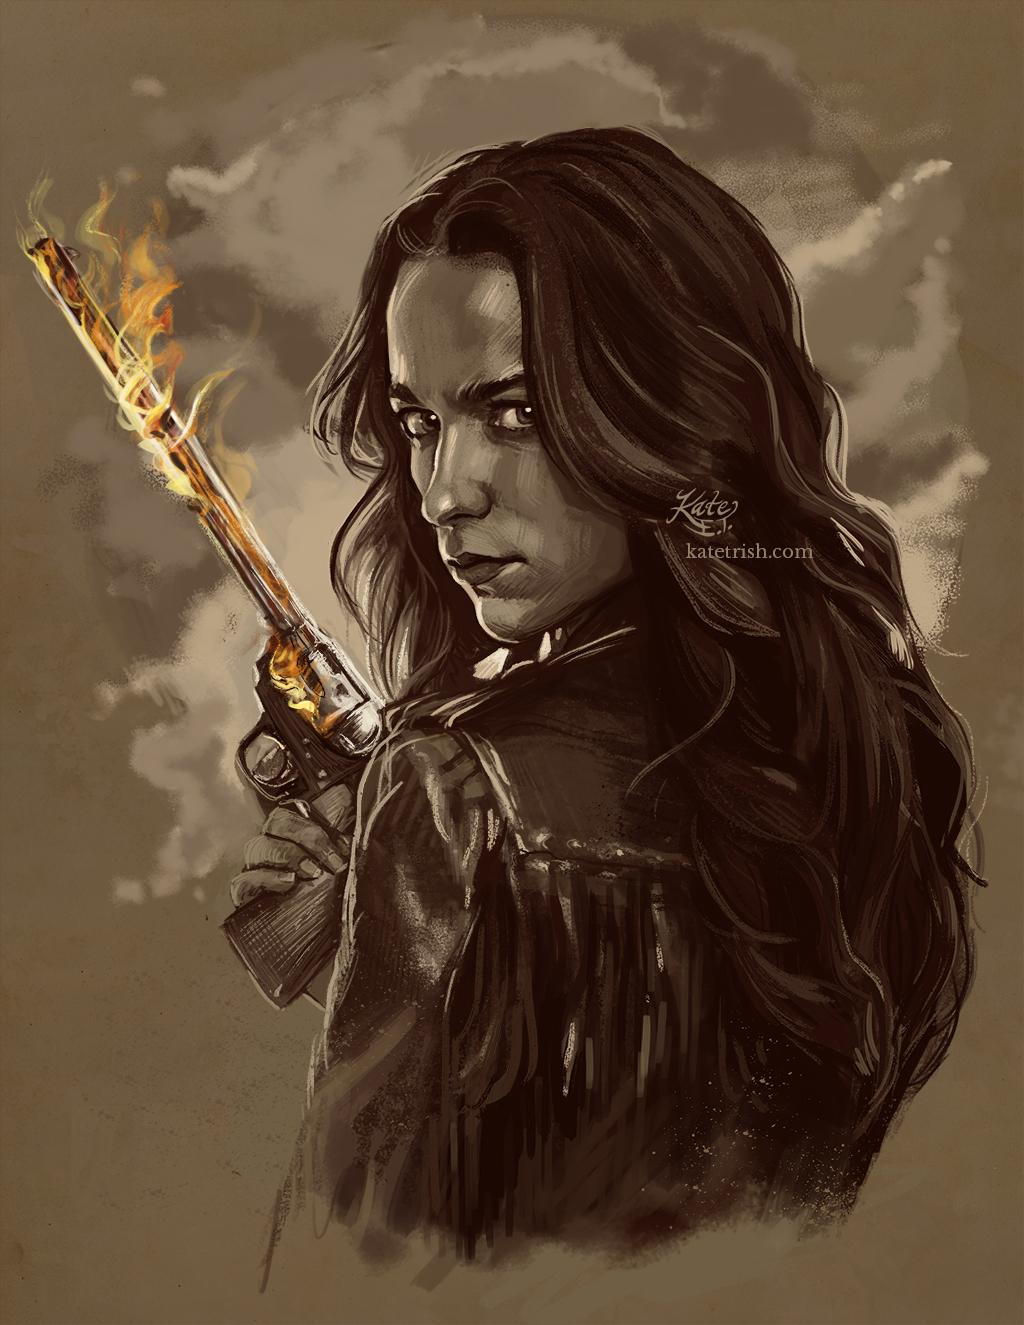 Melanie Scrofano as Wynonna Earp (Wynonna Earp) - Commissioned Print